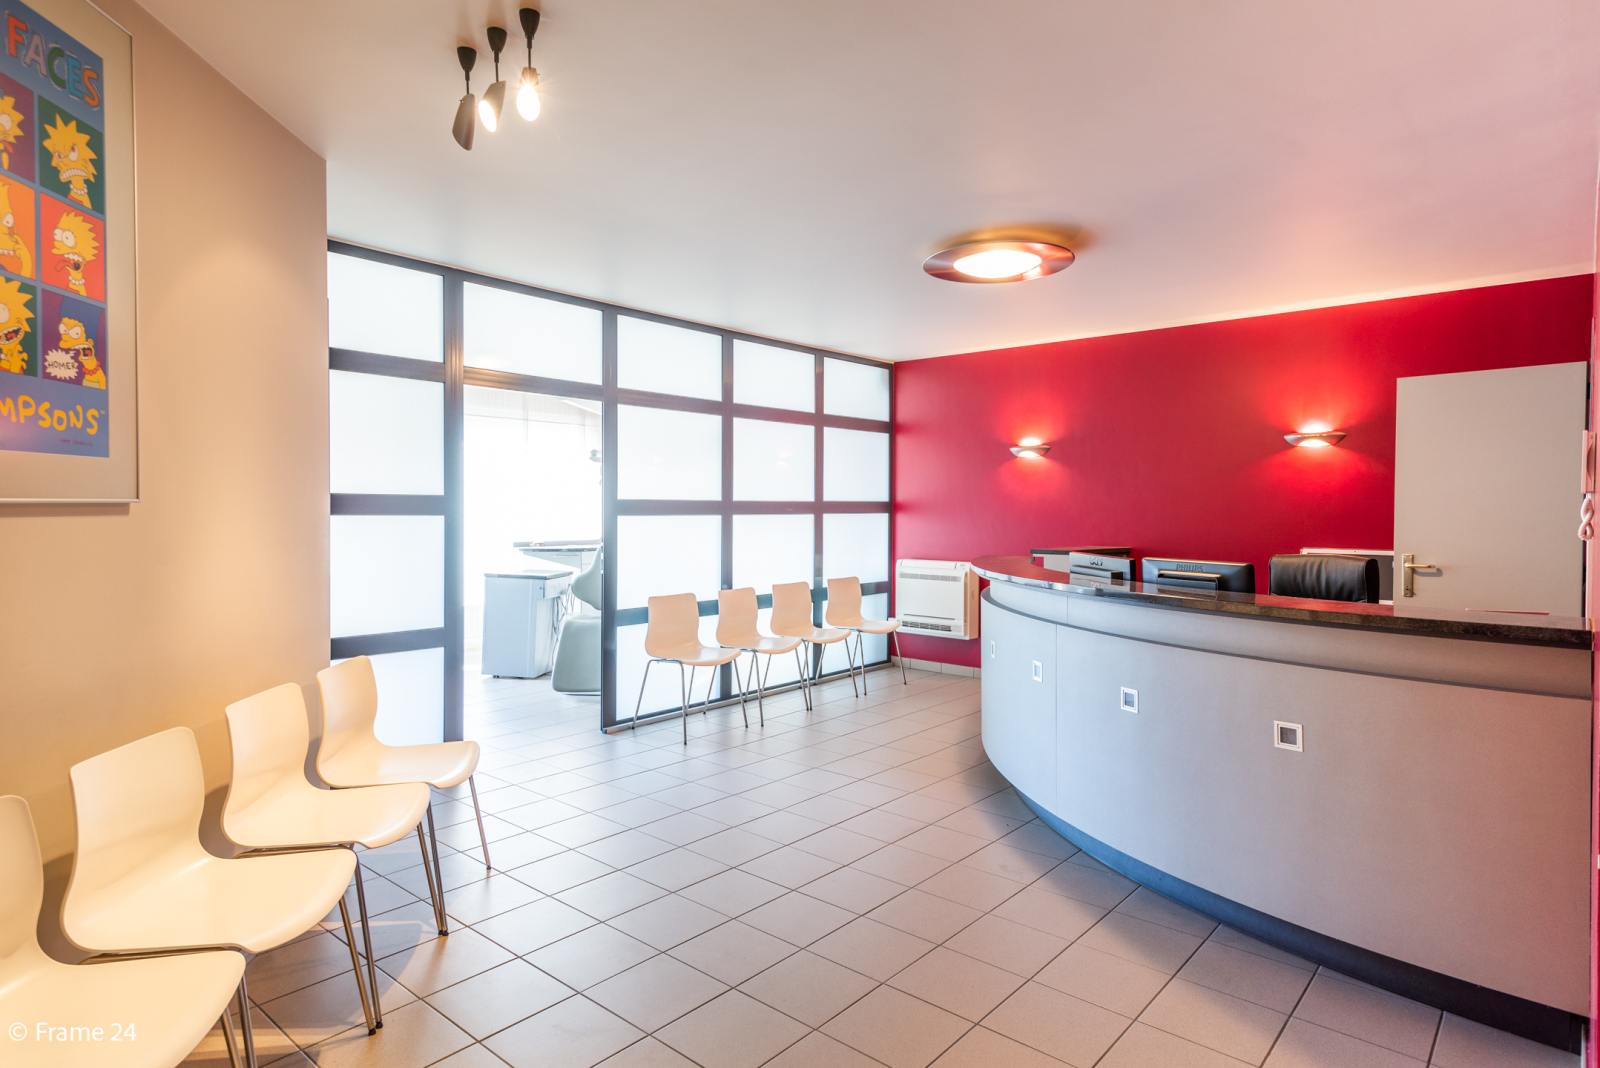 Orthodontiepraktijk op centrale ligging te Deurne! afbeelding 1